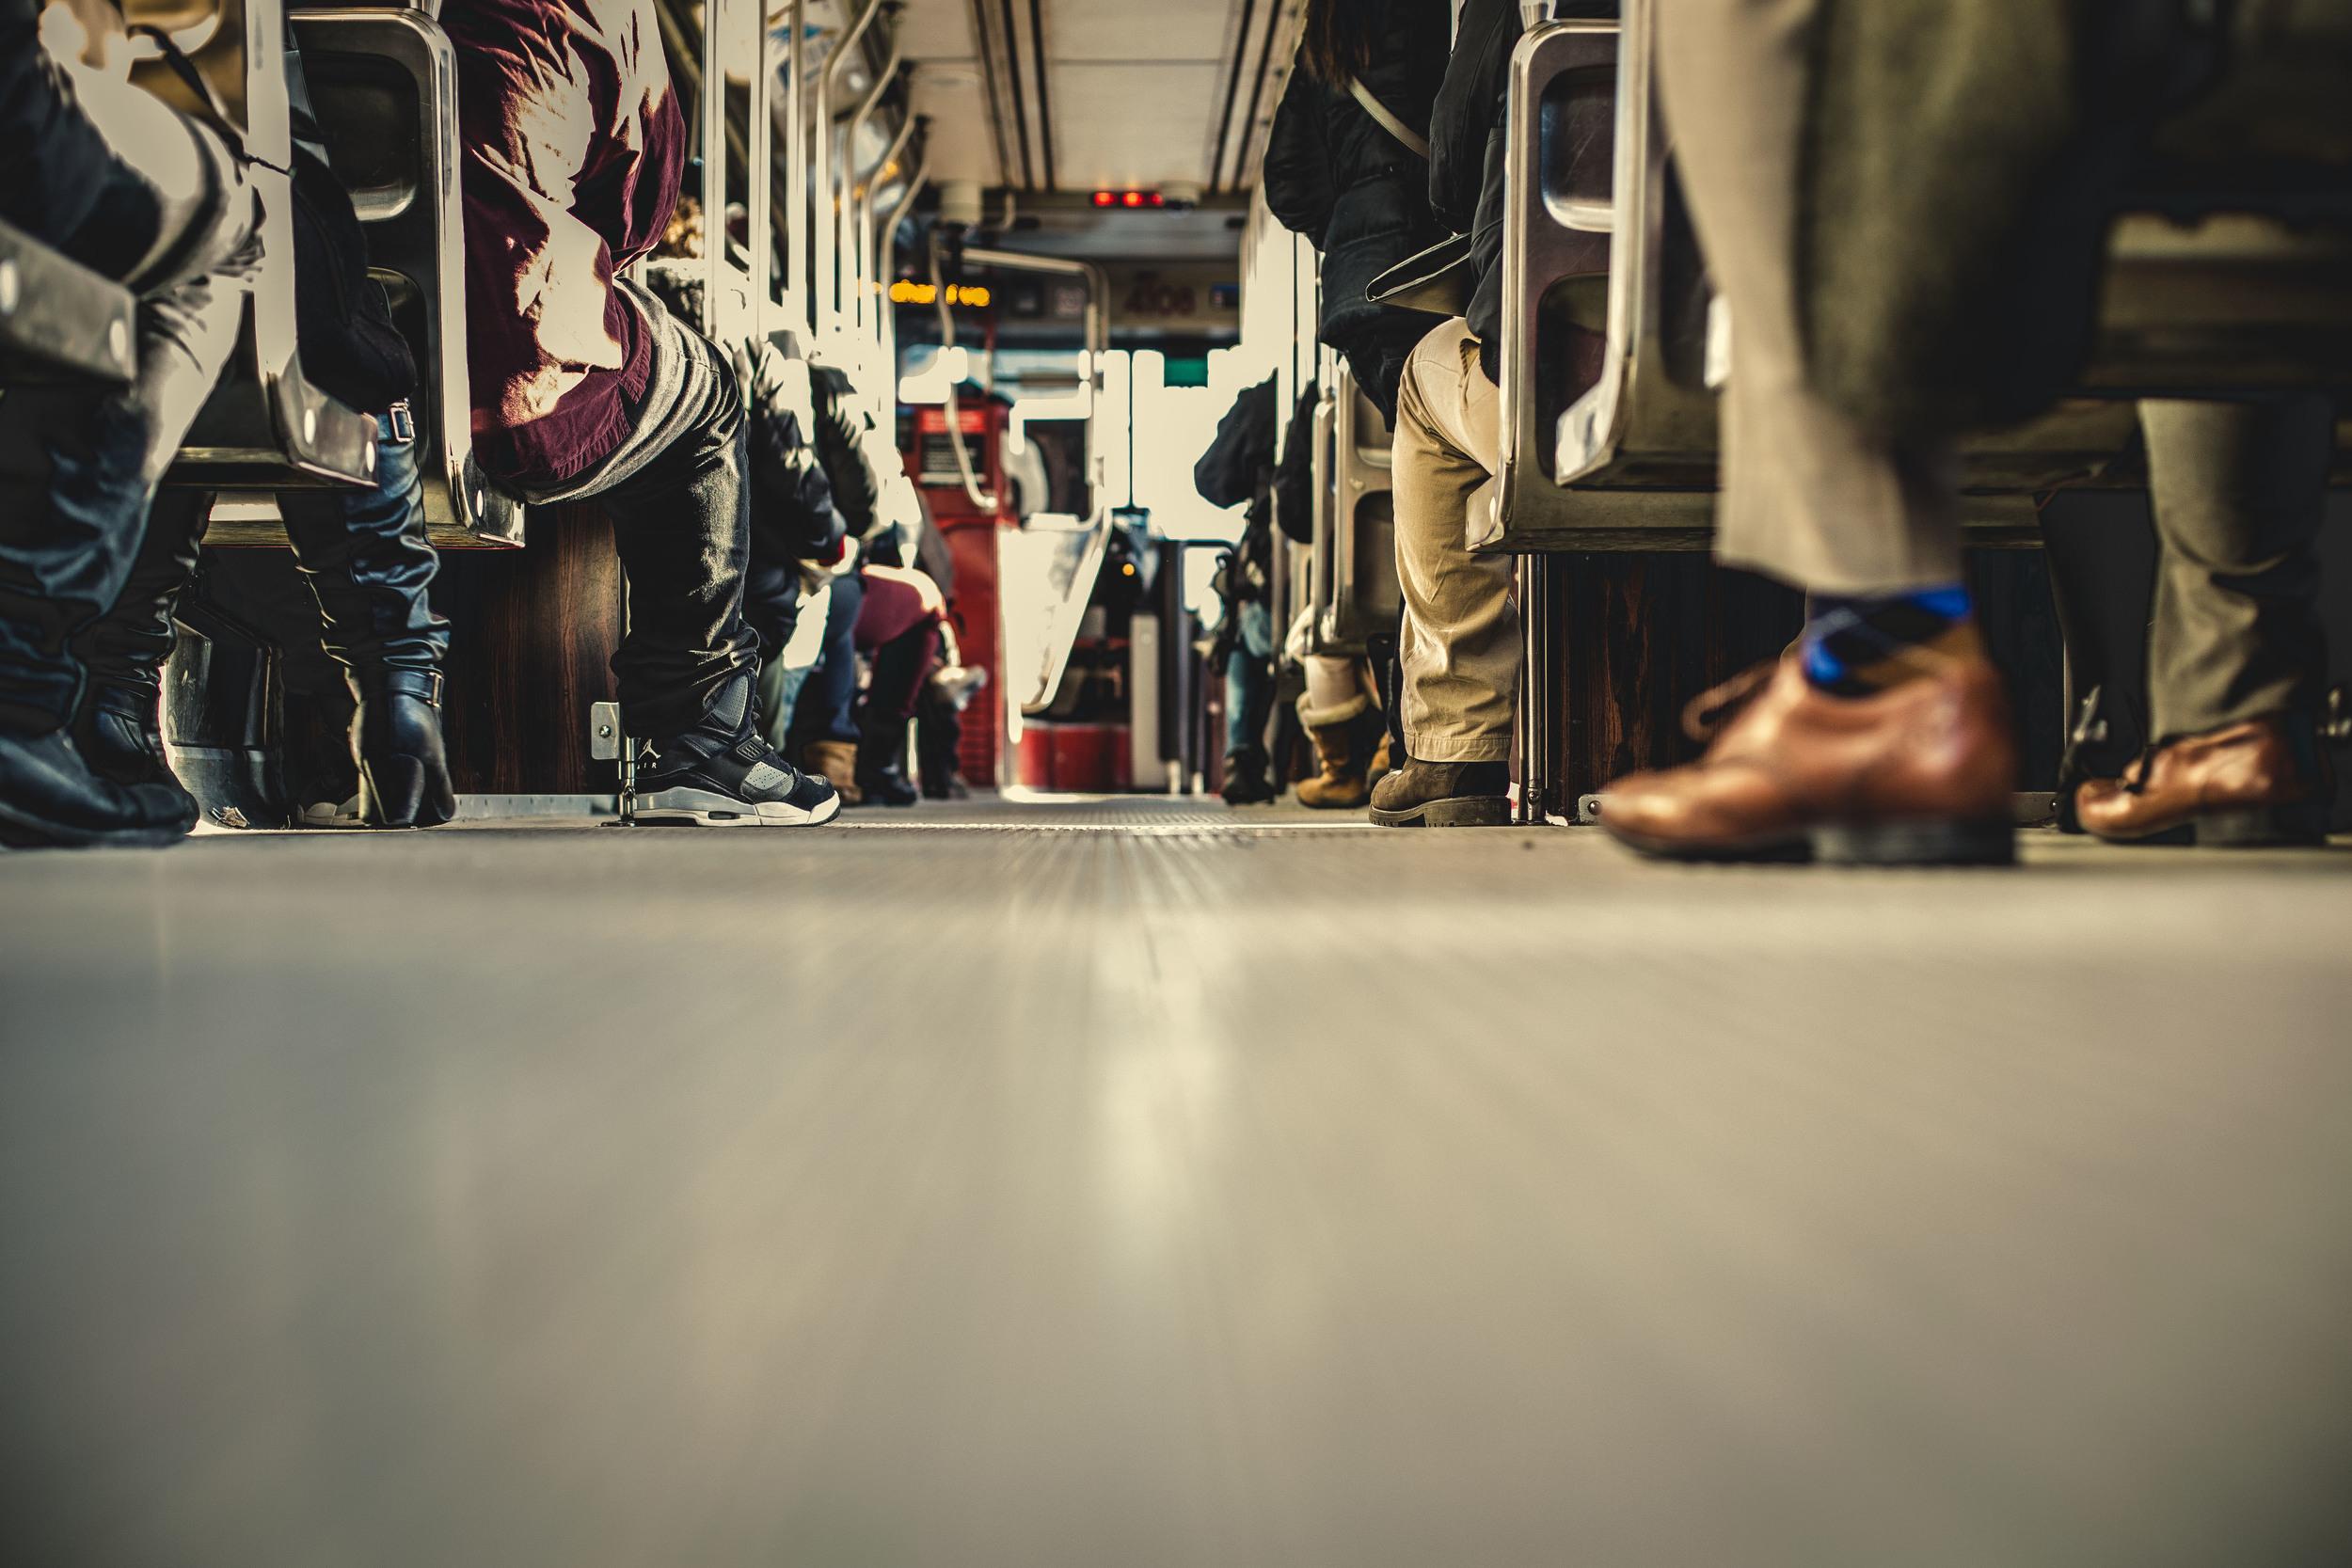 Student Travel blog